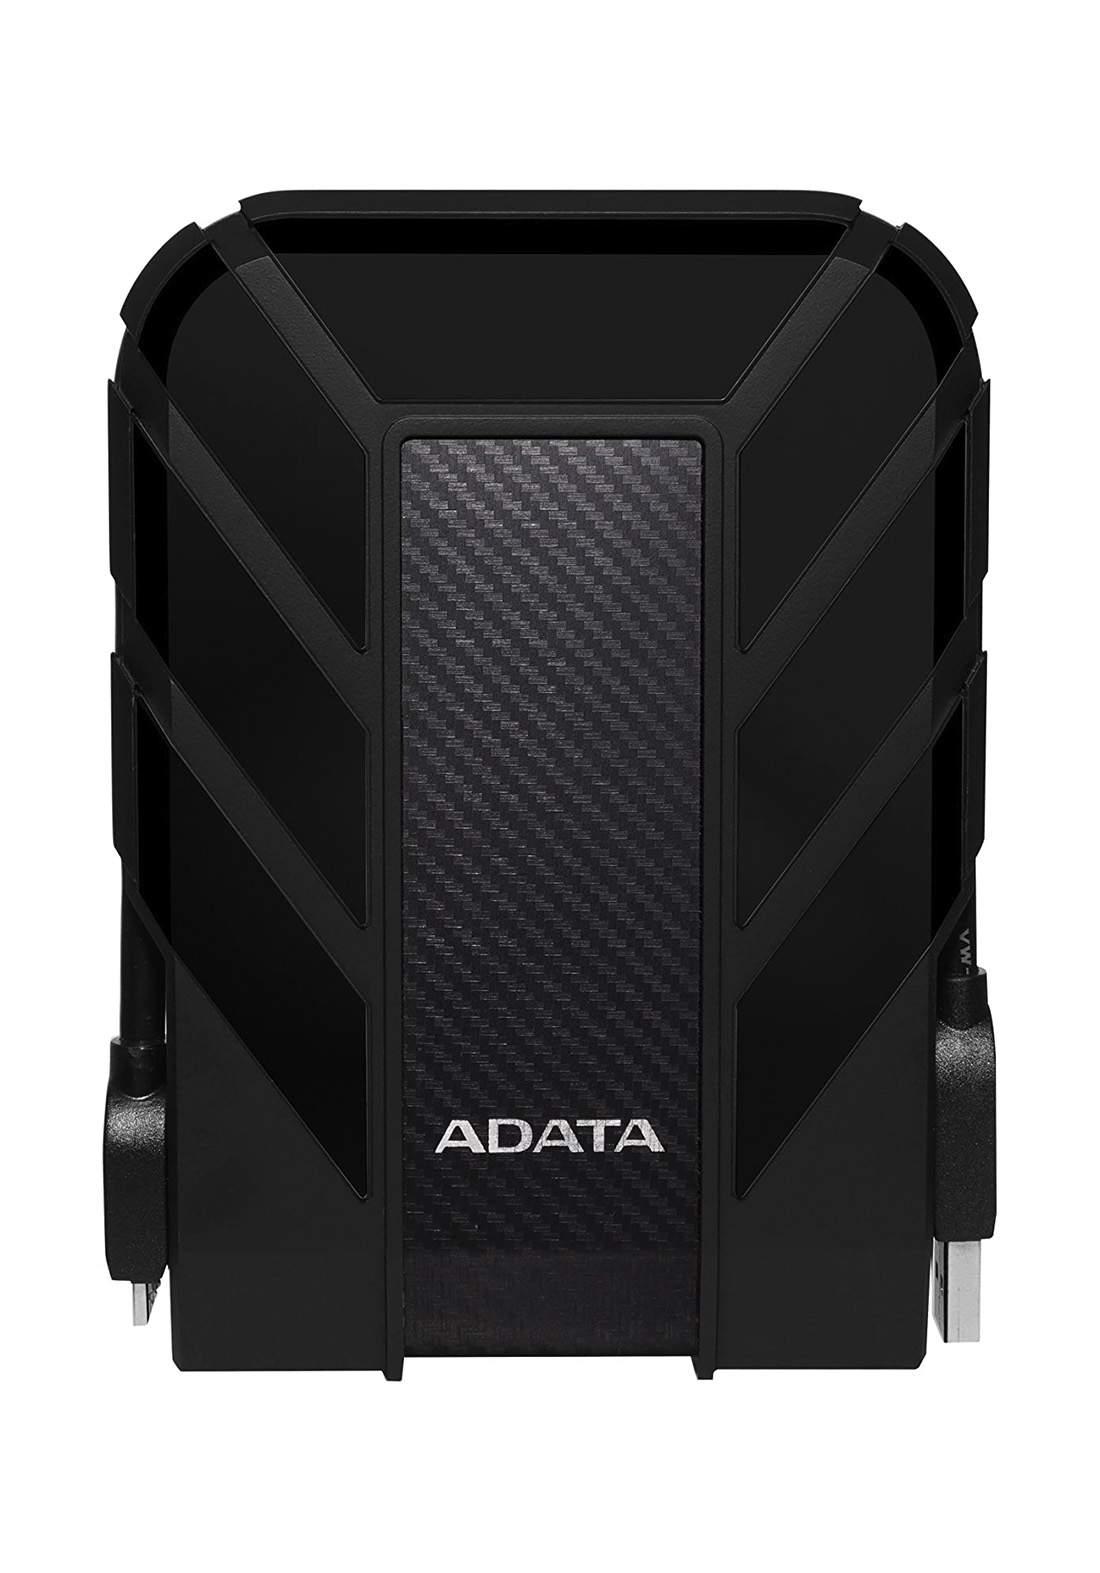 ADATA HD710 Pro 1TB USB 3.1 External Hard Drive - Black هارد خارجي محمول